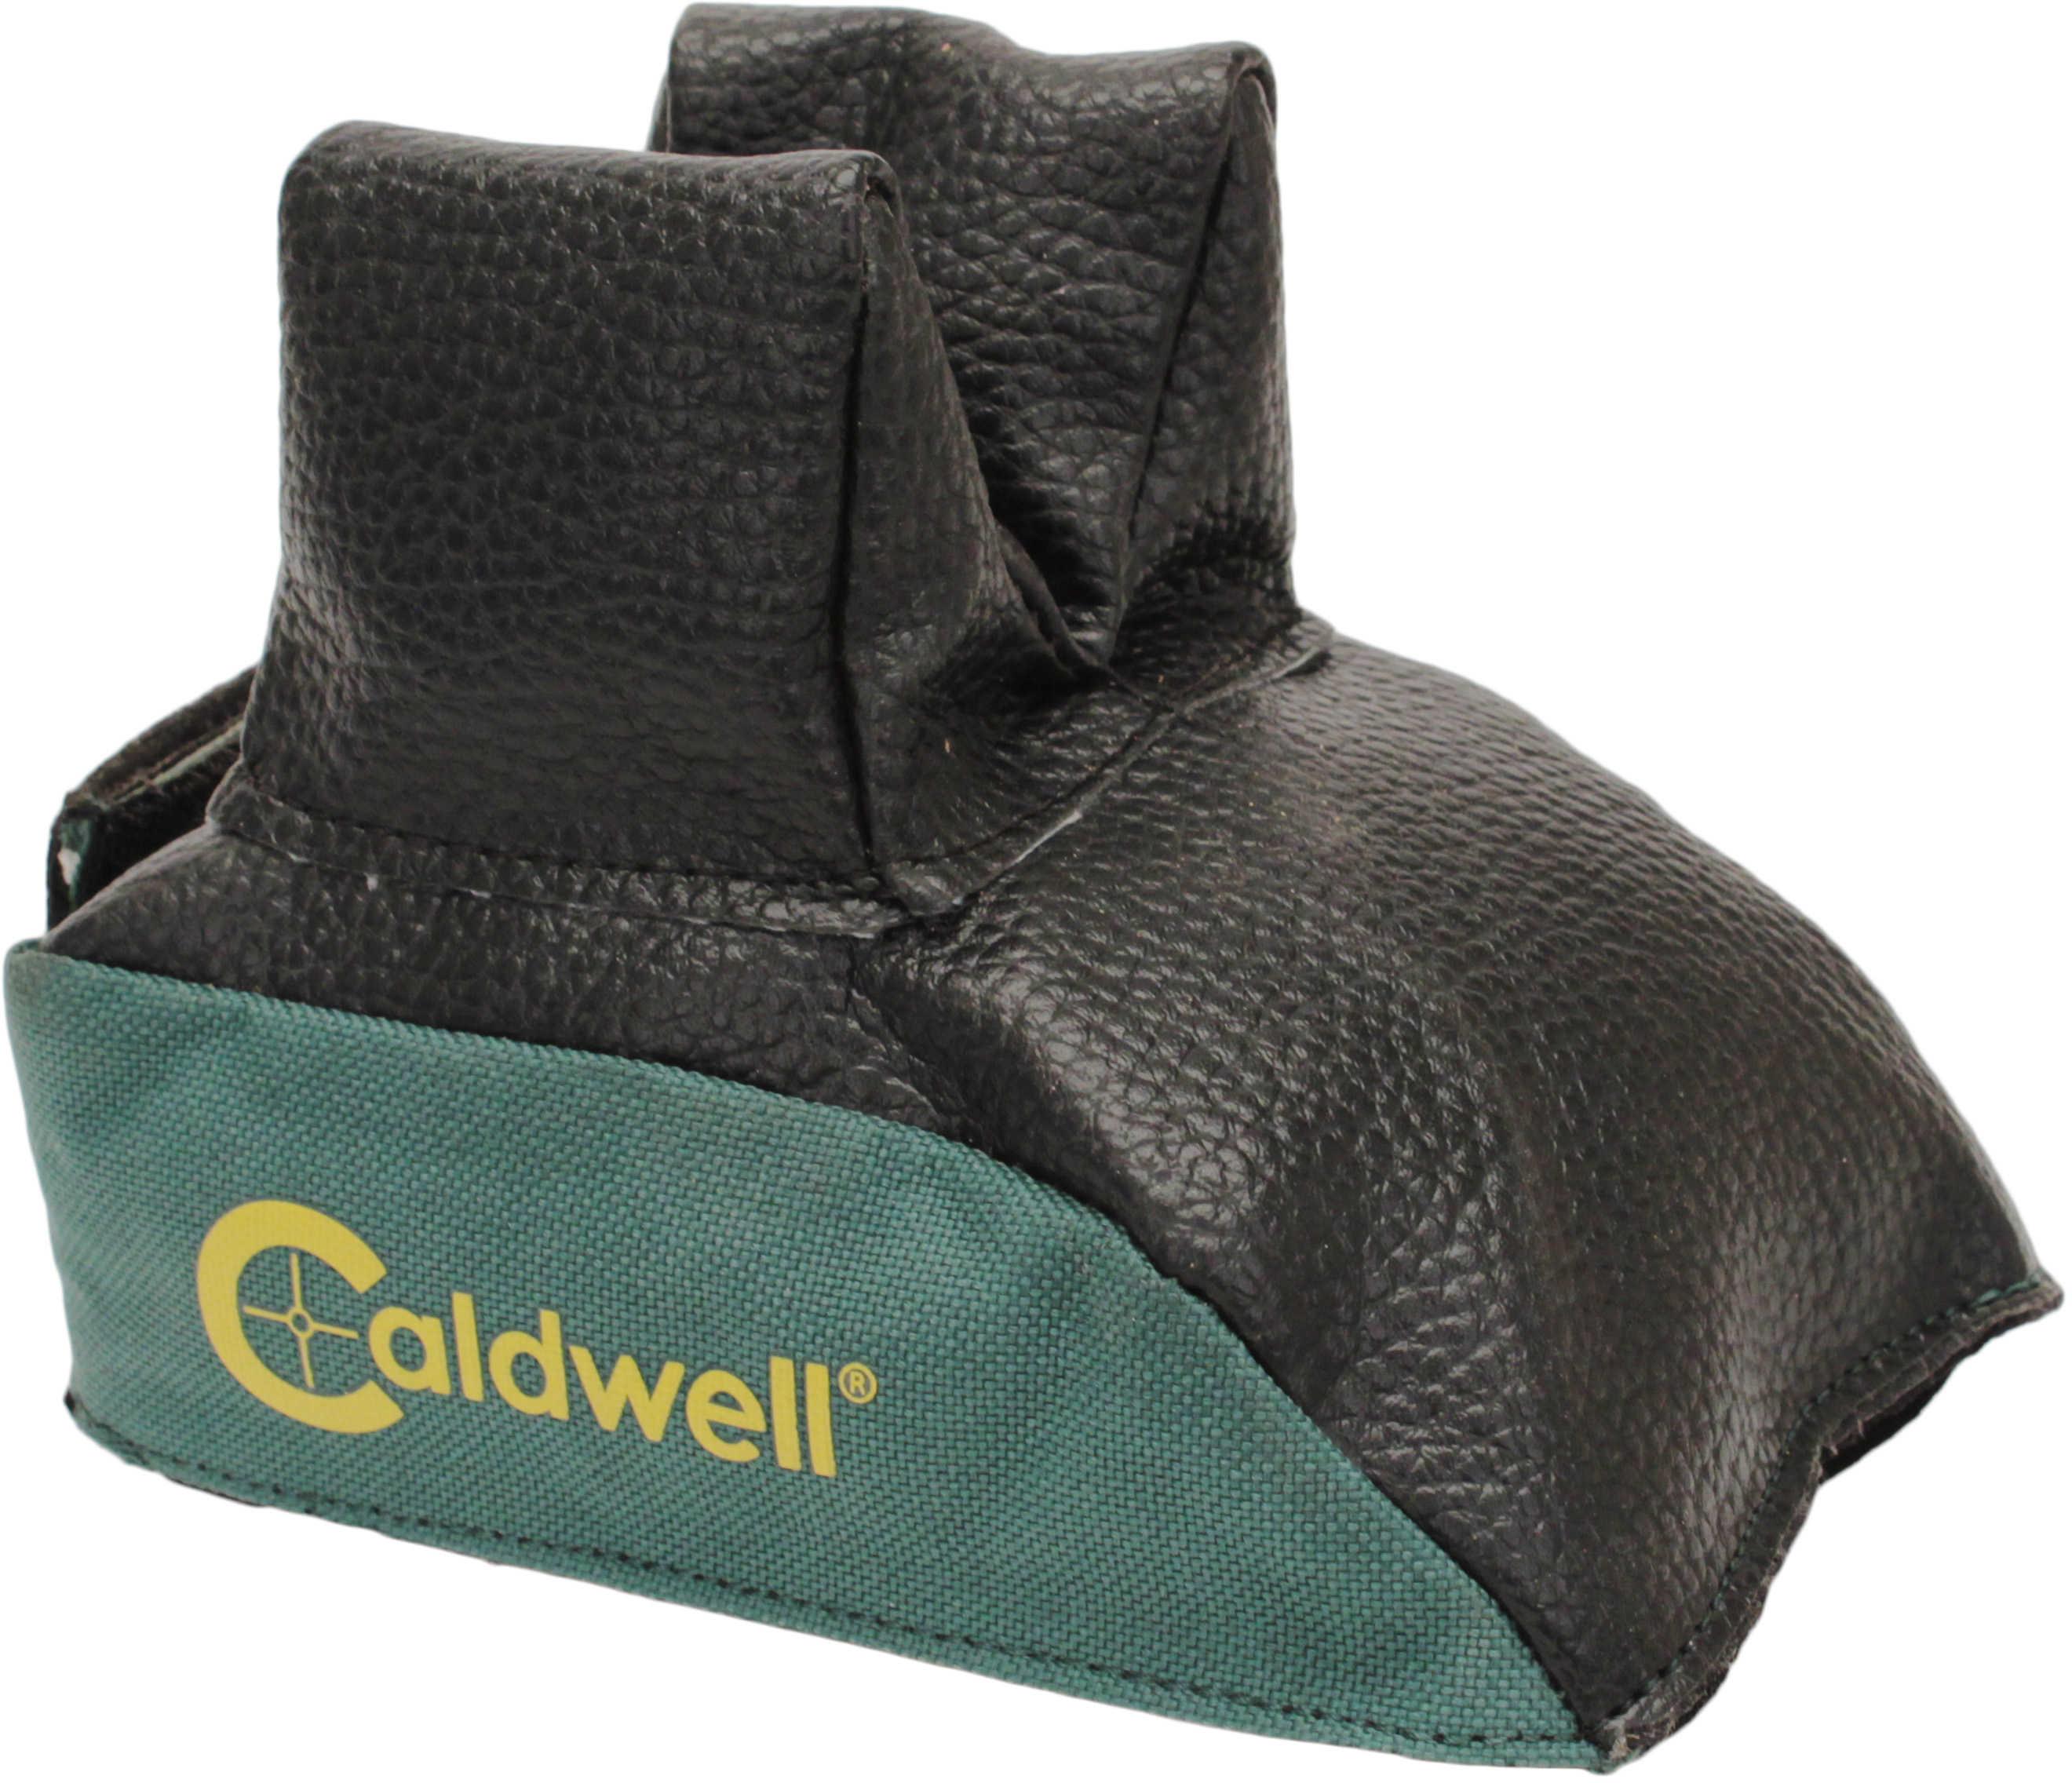 Caldwell Universal Shooting Bag Rest Green/Black Rear Standard Size 226645